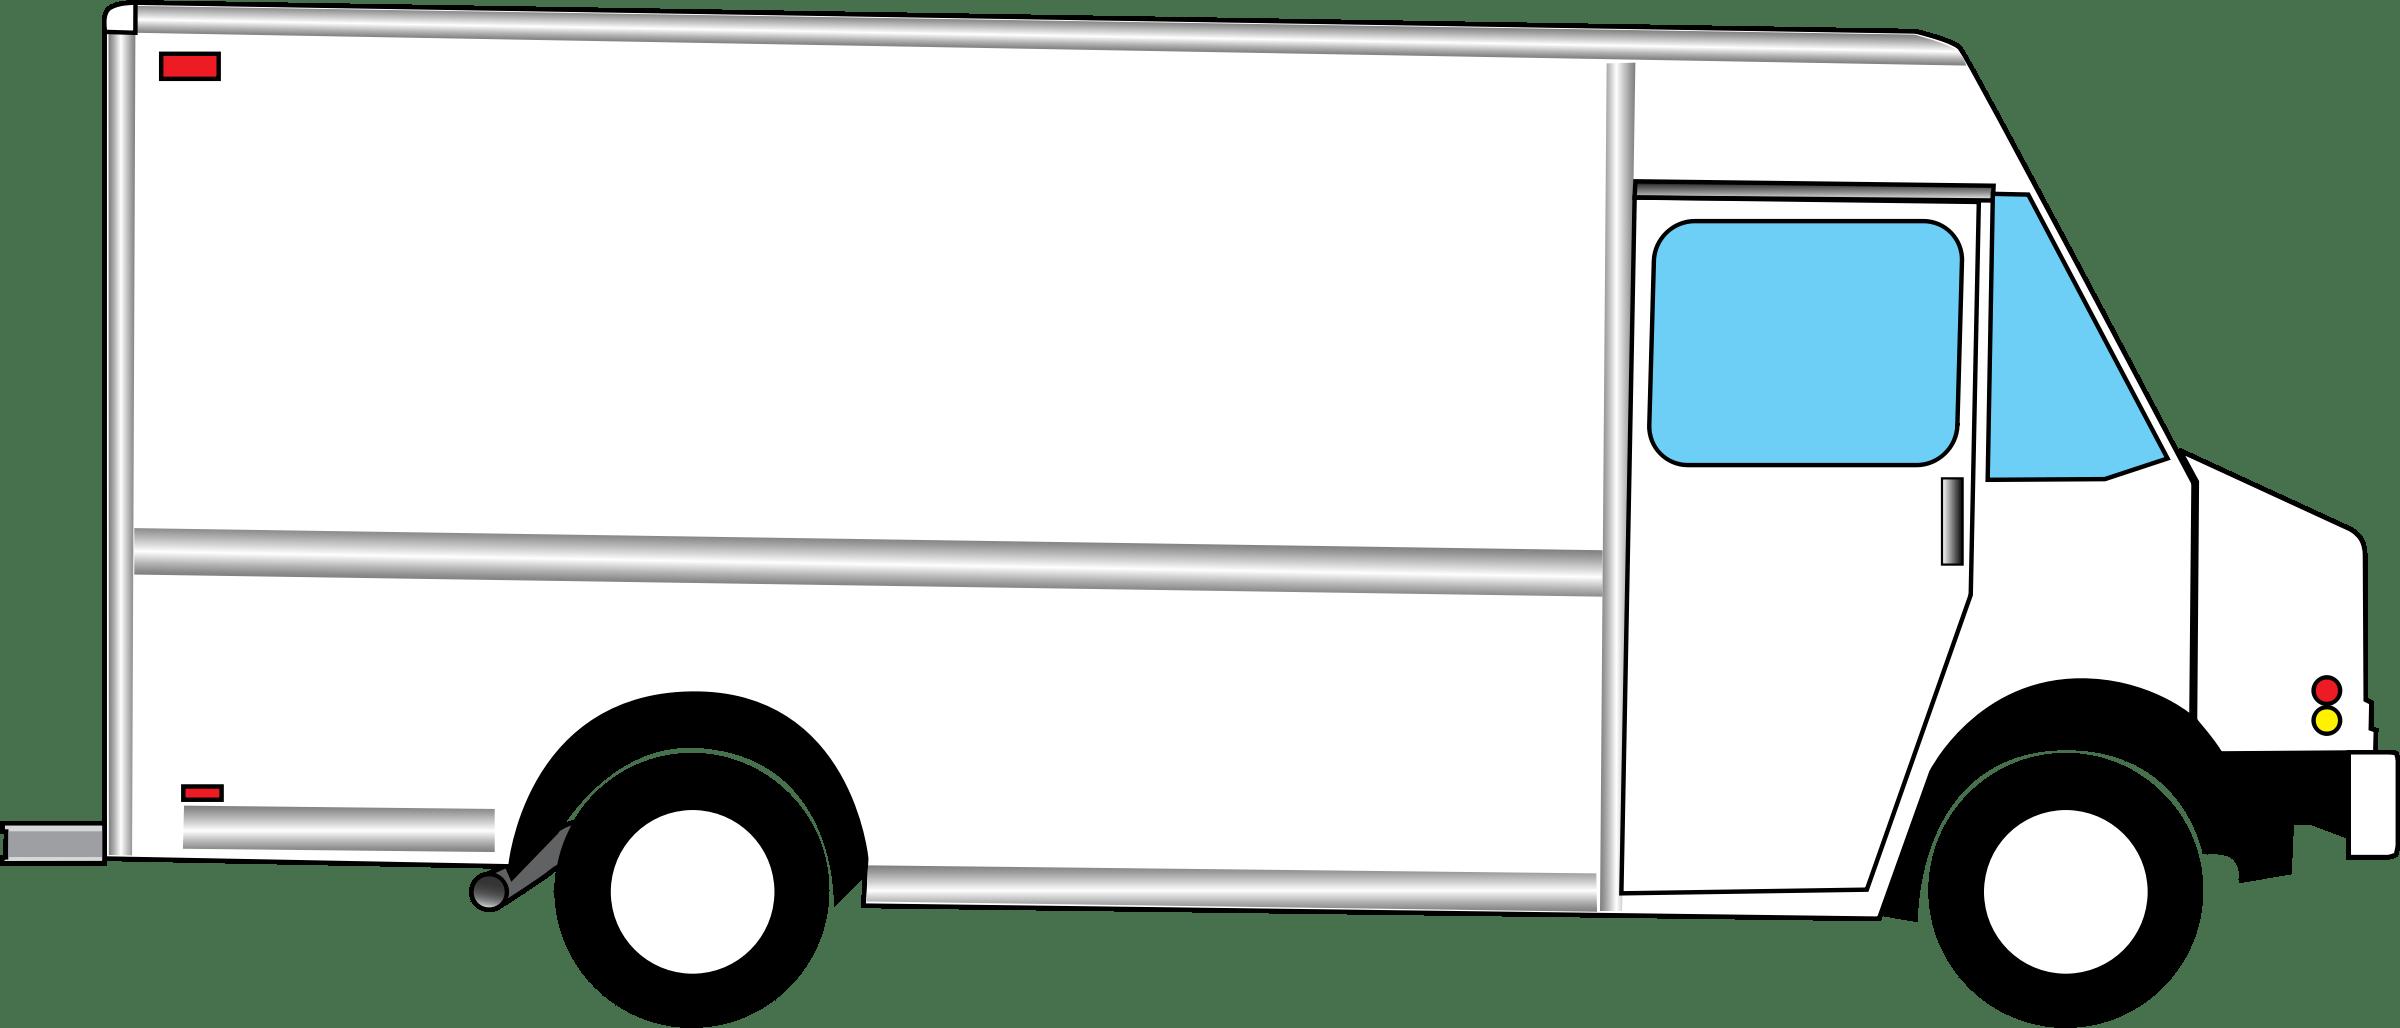 Mailman Clipart Truck Usps Mailman Truck Usps Transparent